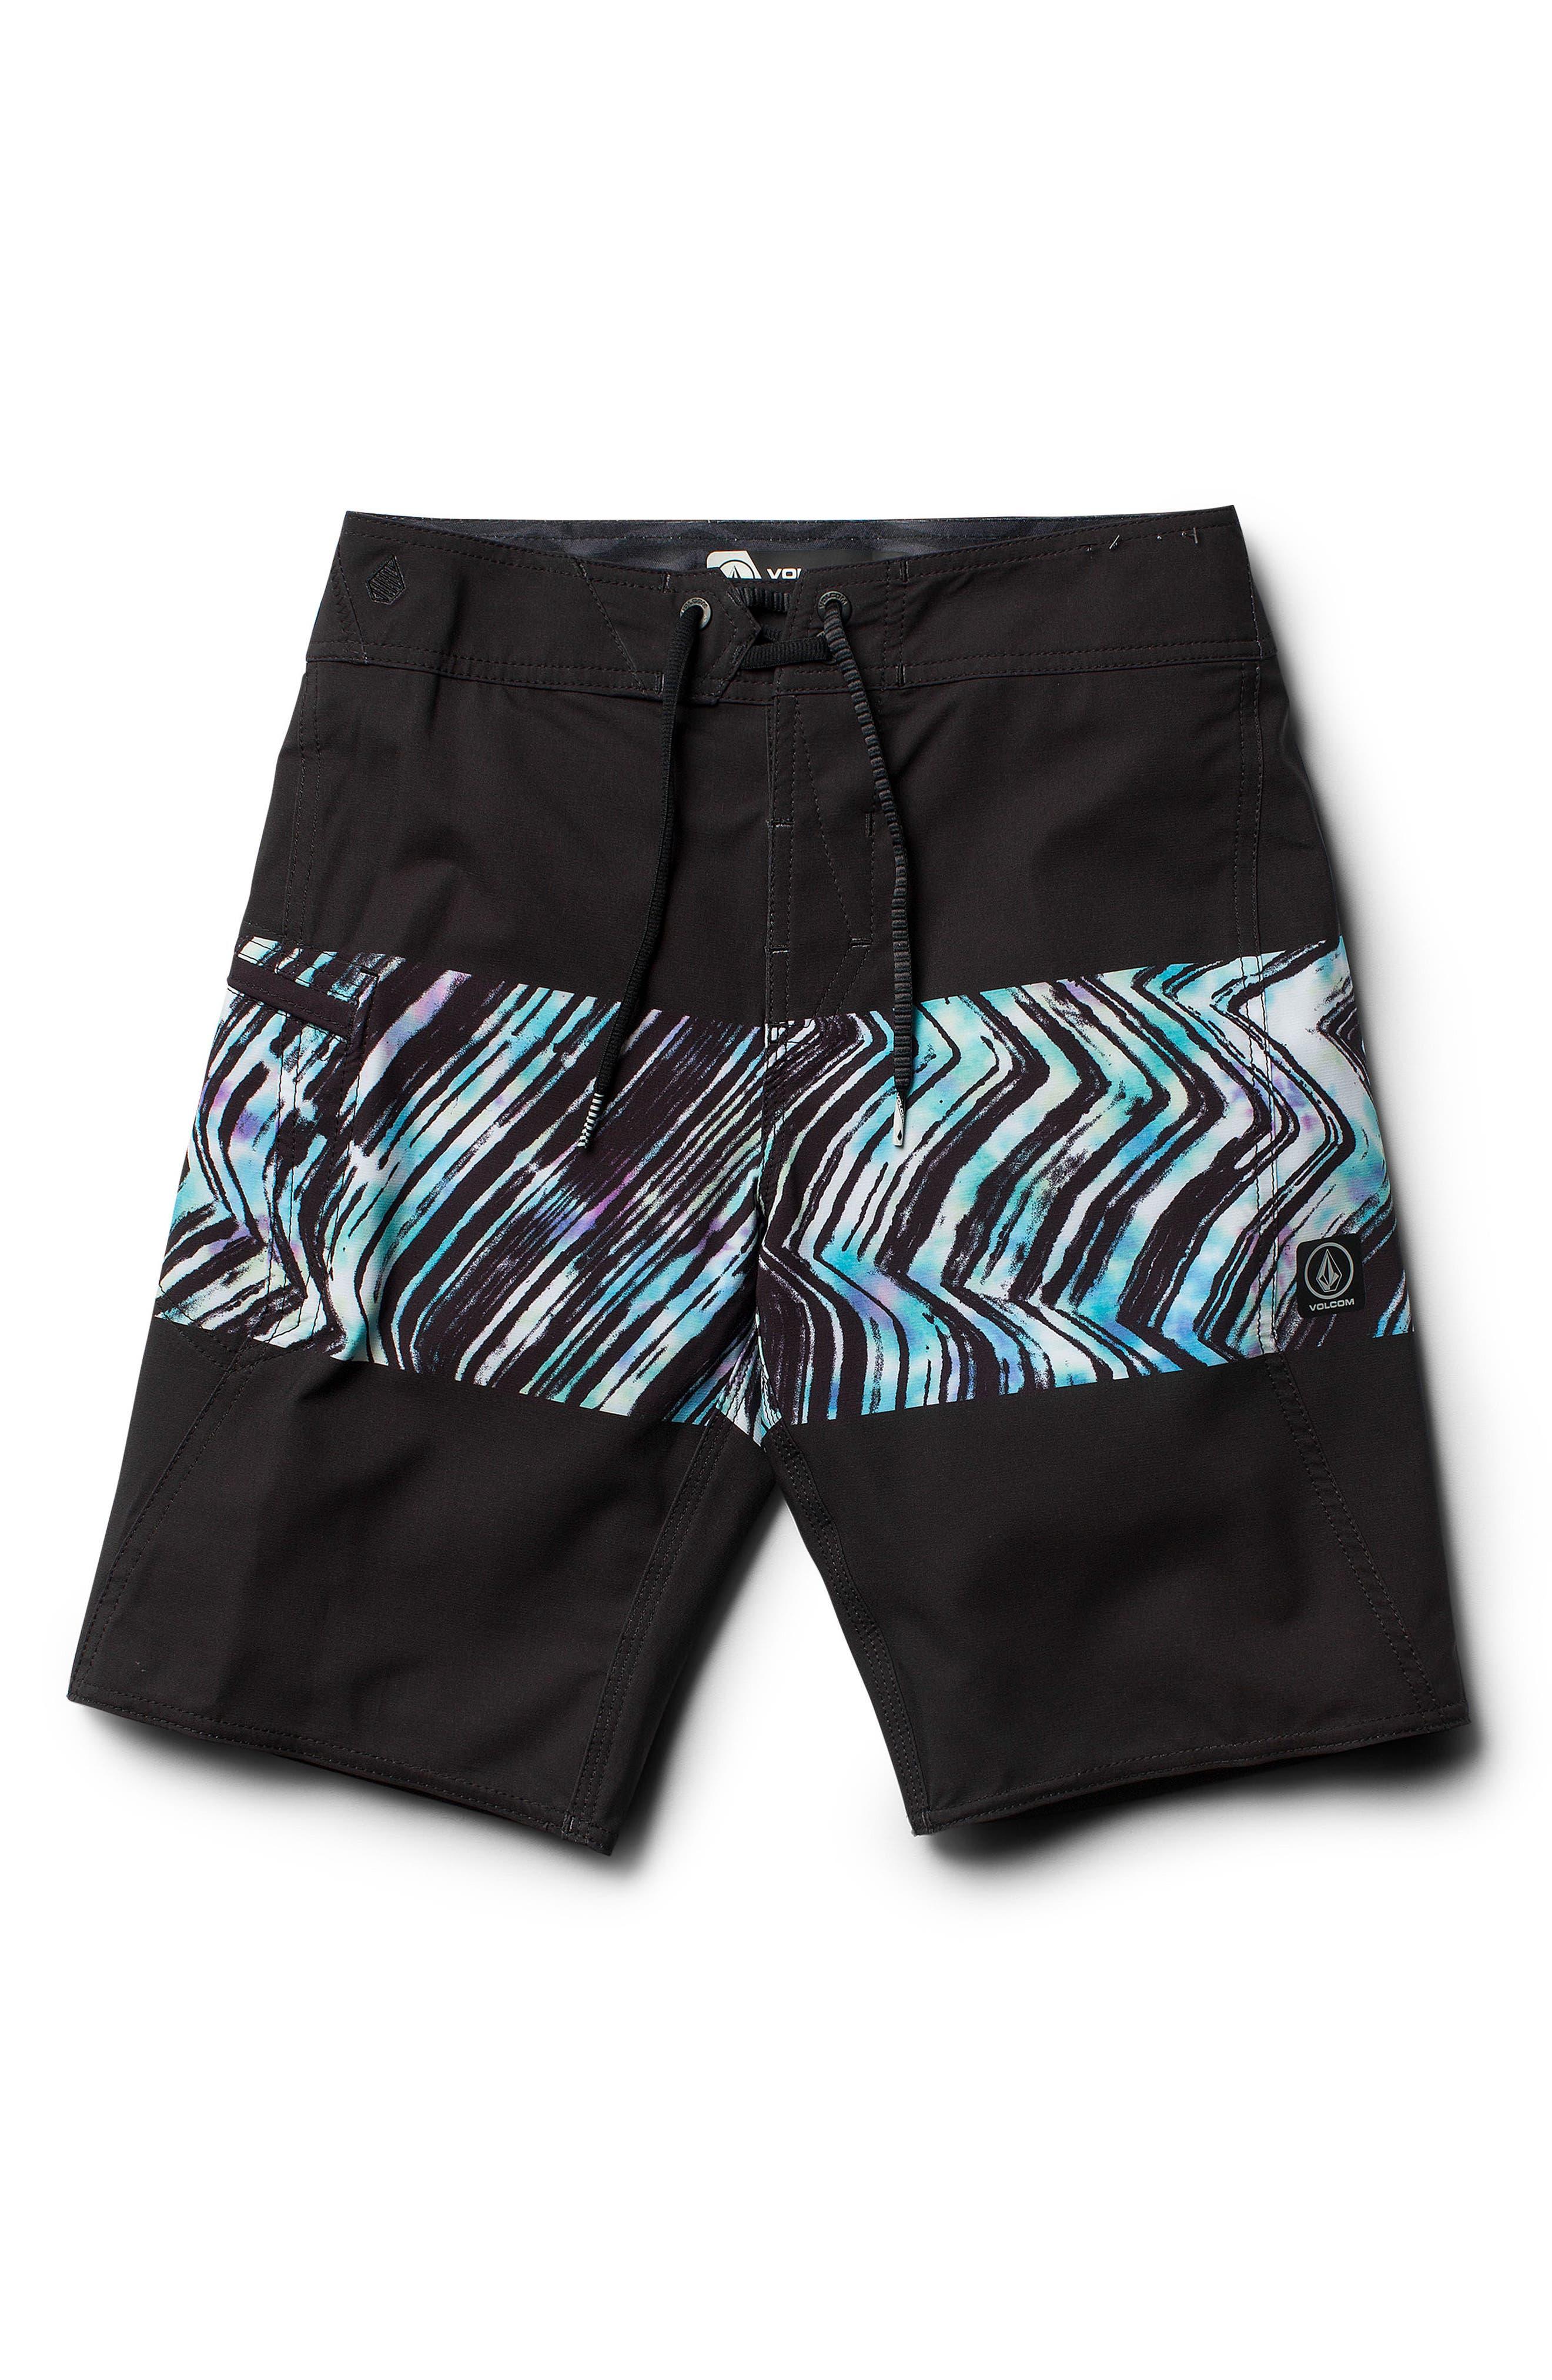 Macaw Board Shorts,                         Main,                         color, 001